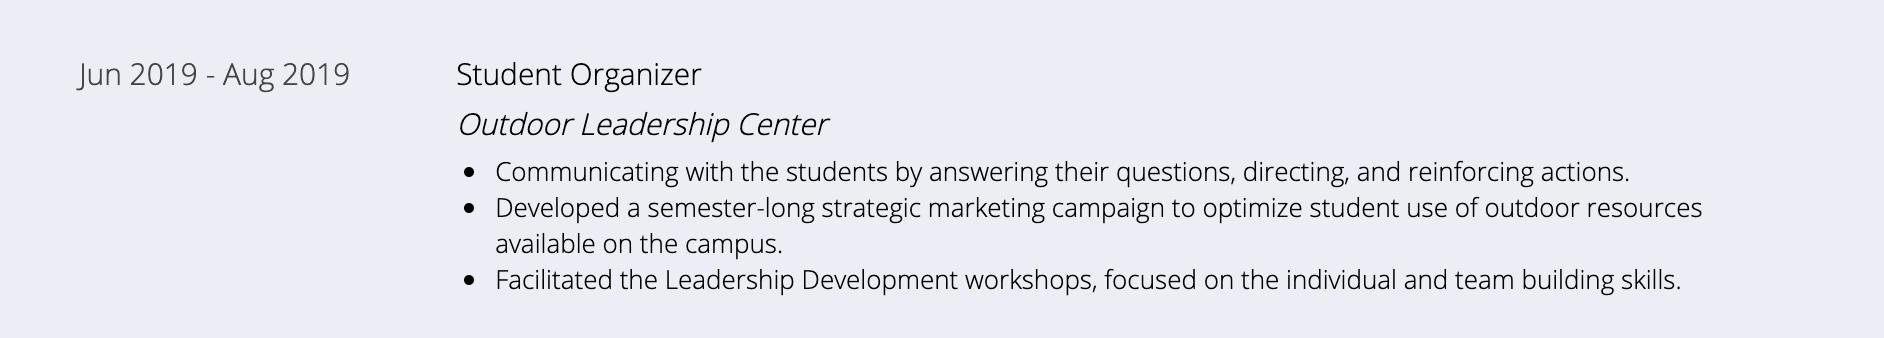 student-organizer